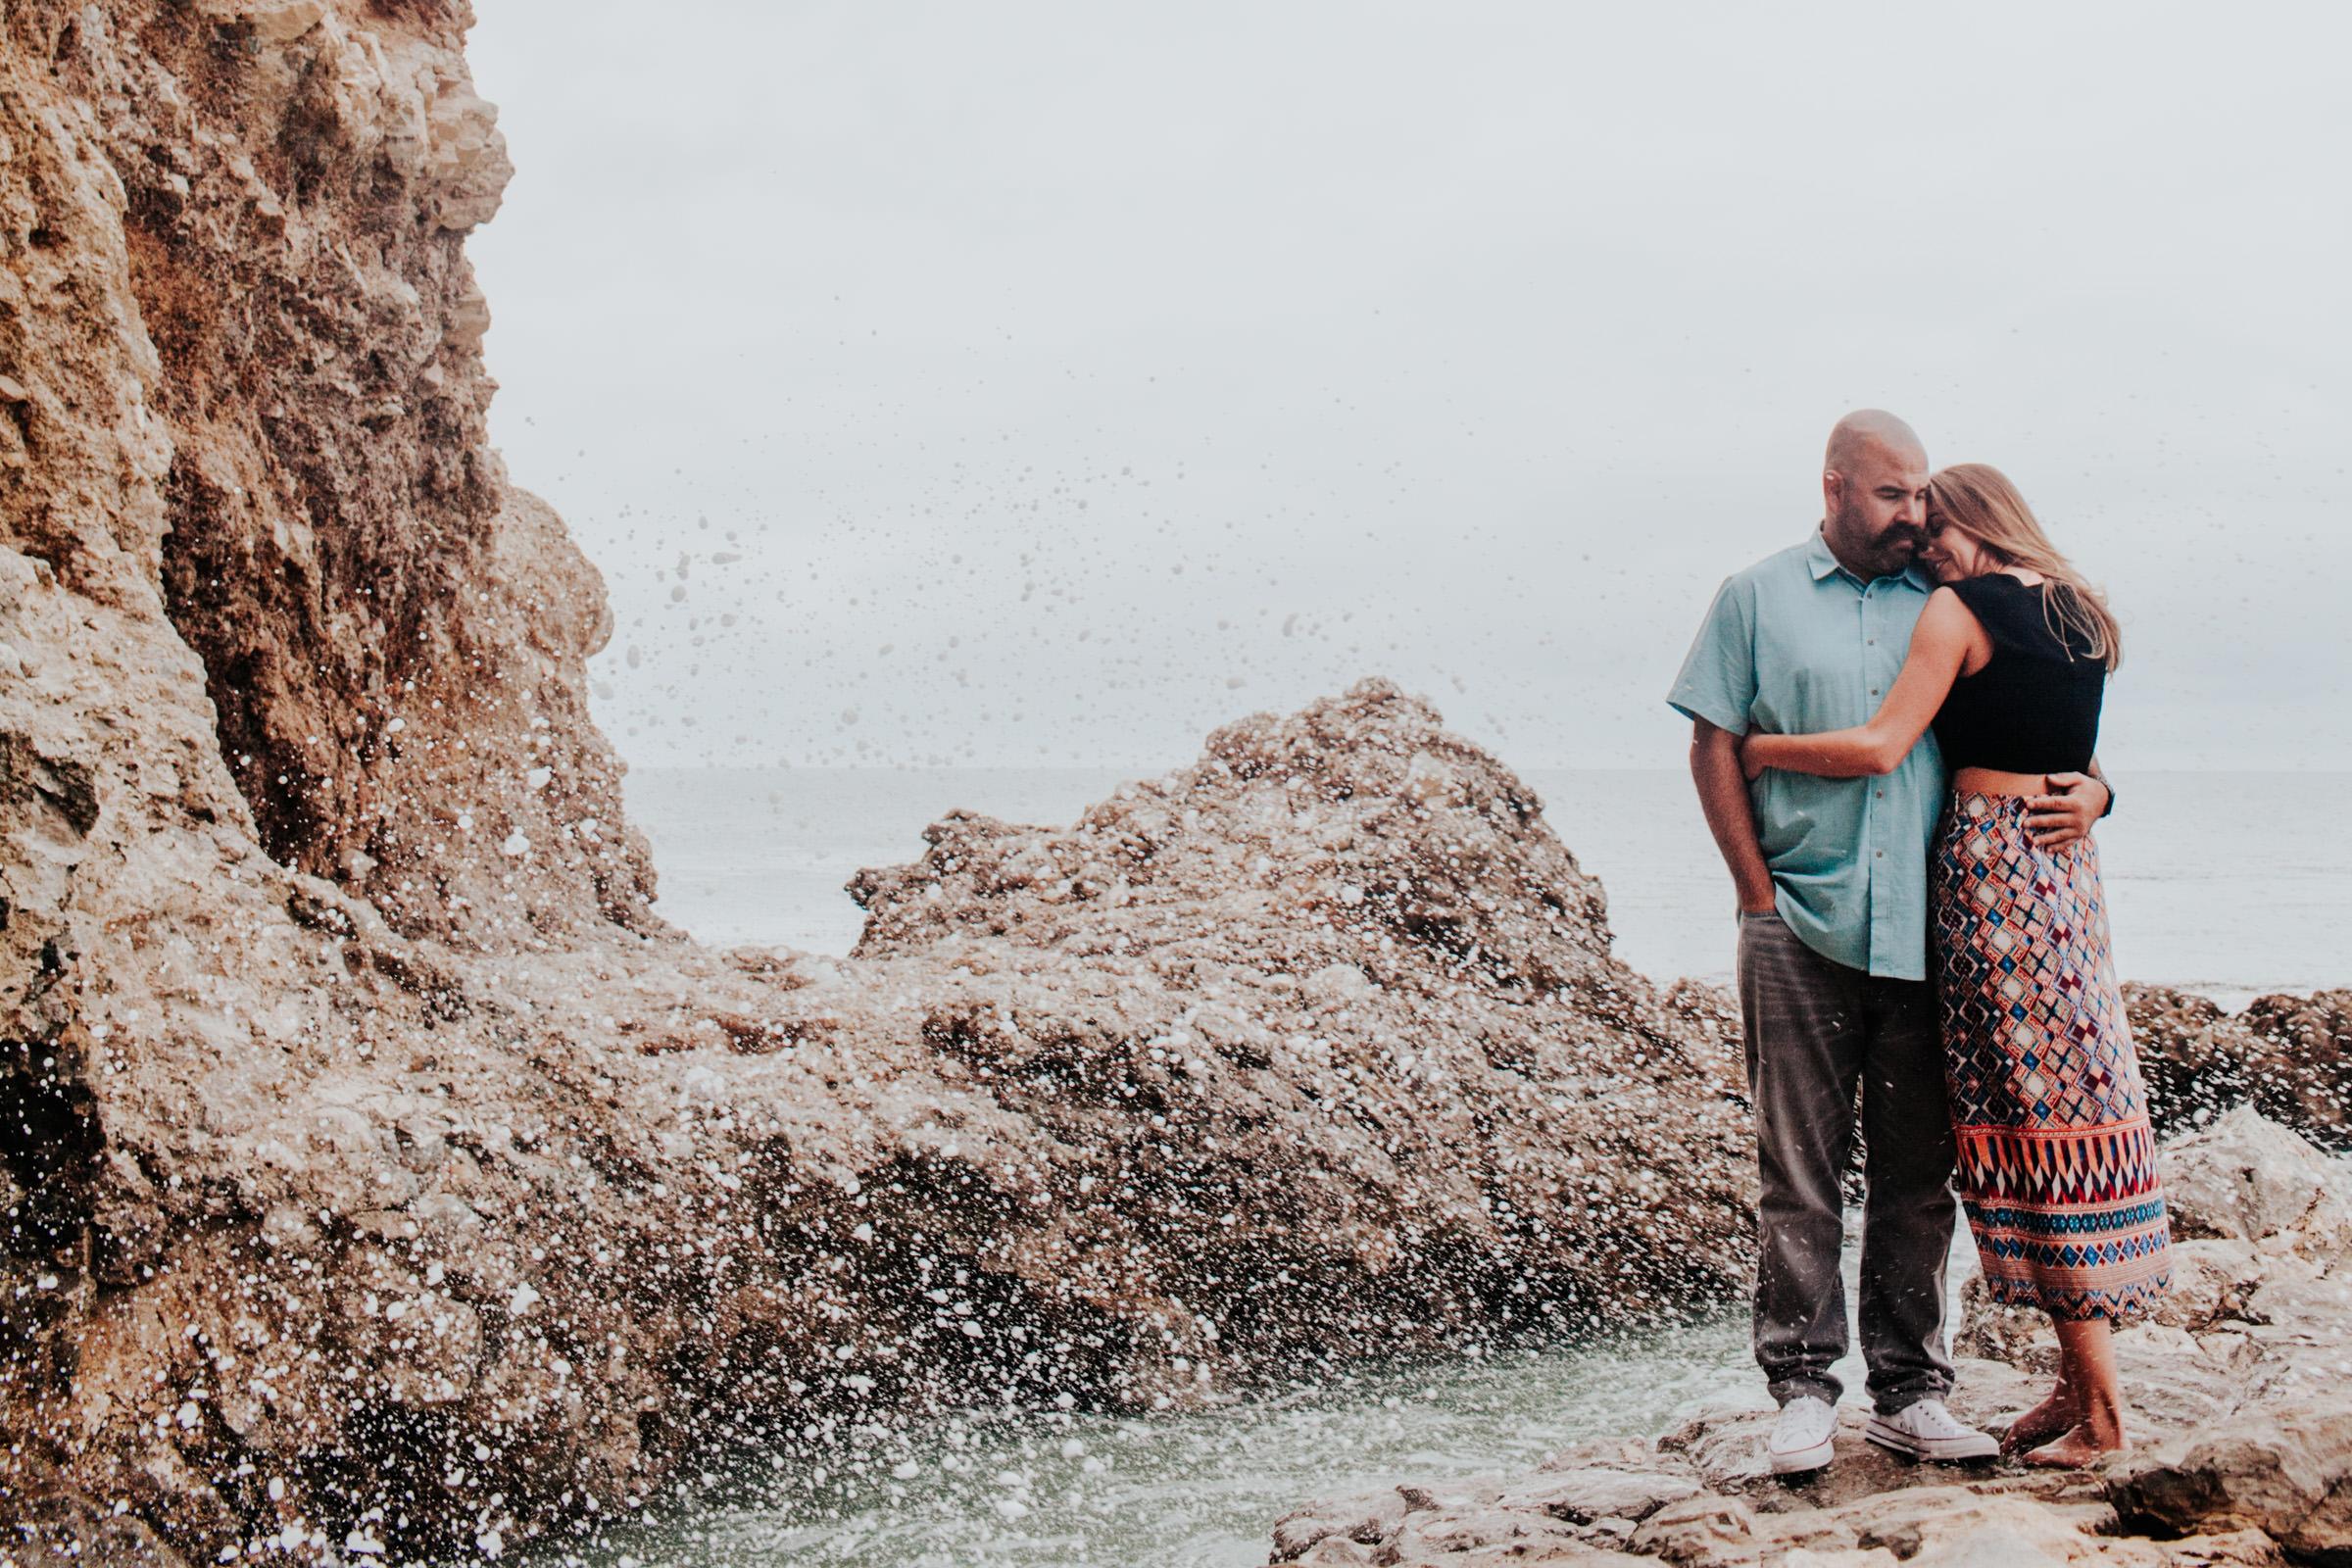 terranea-resort-palos-verdes-california-wedding-photography-cove-los-angeles-pierce-102.jpg